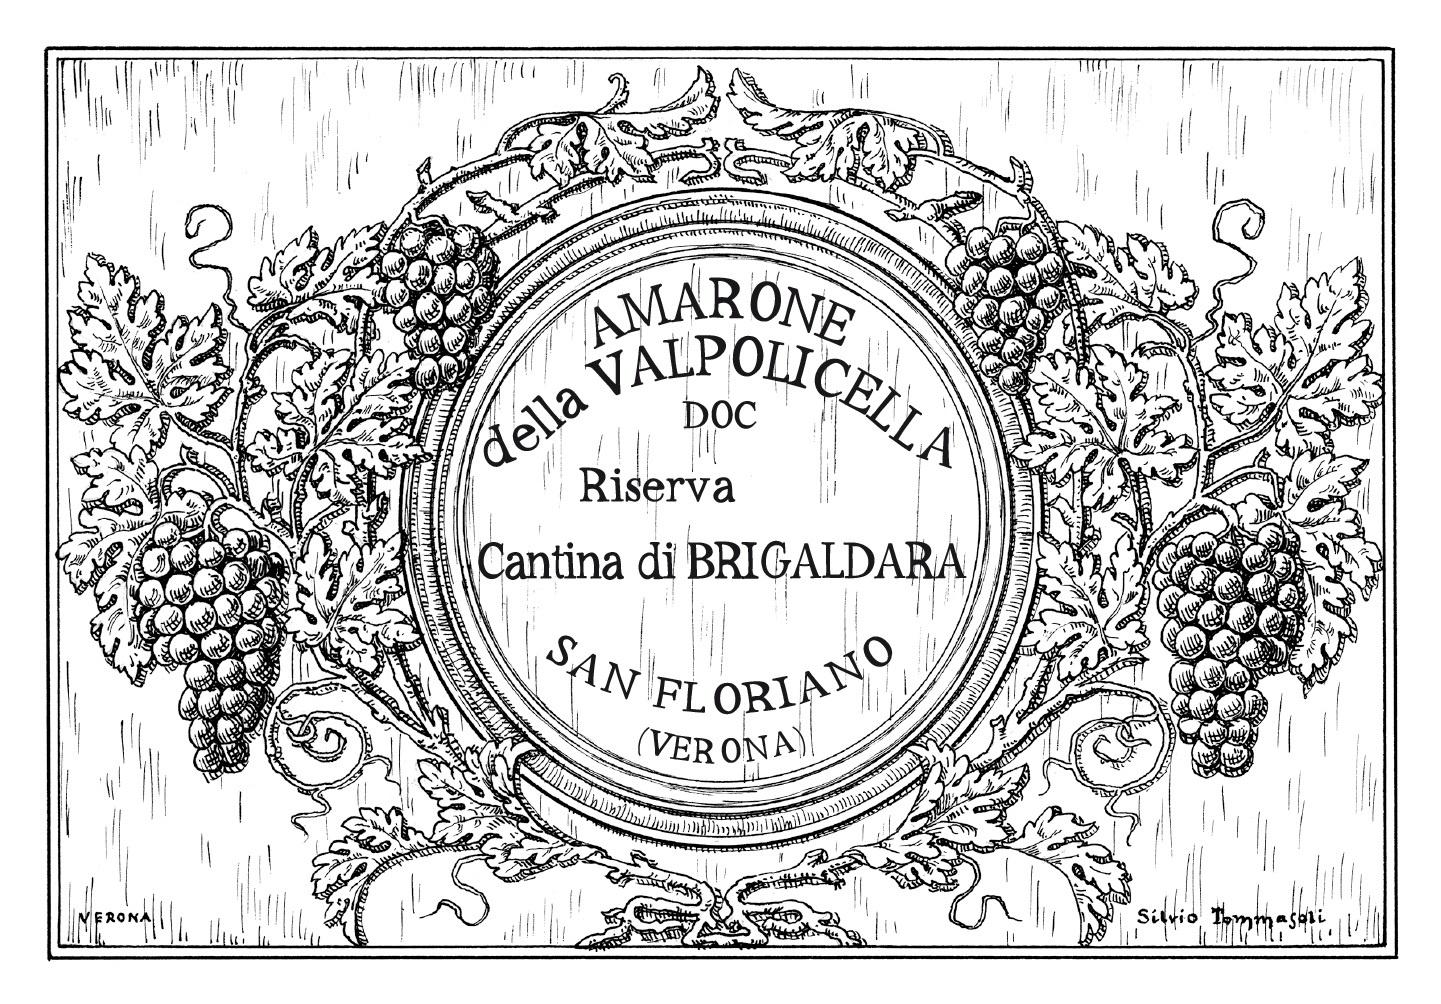 Brigaldara, Amarone Riserva, 2011